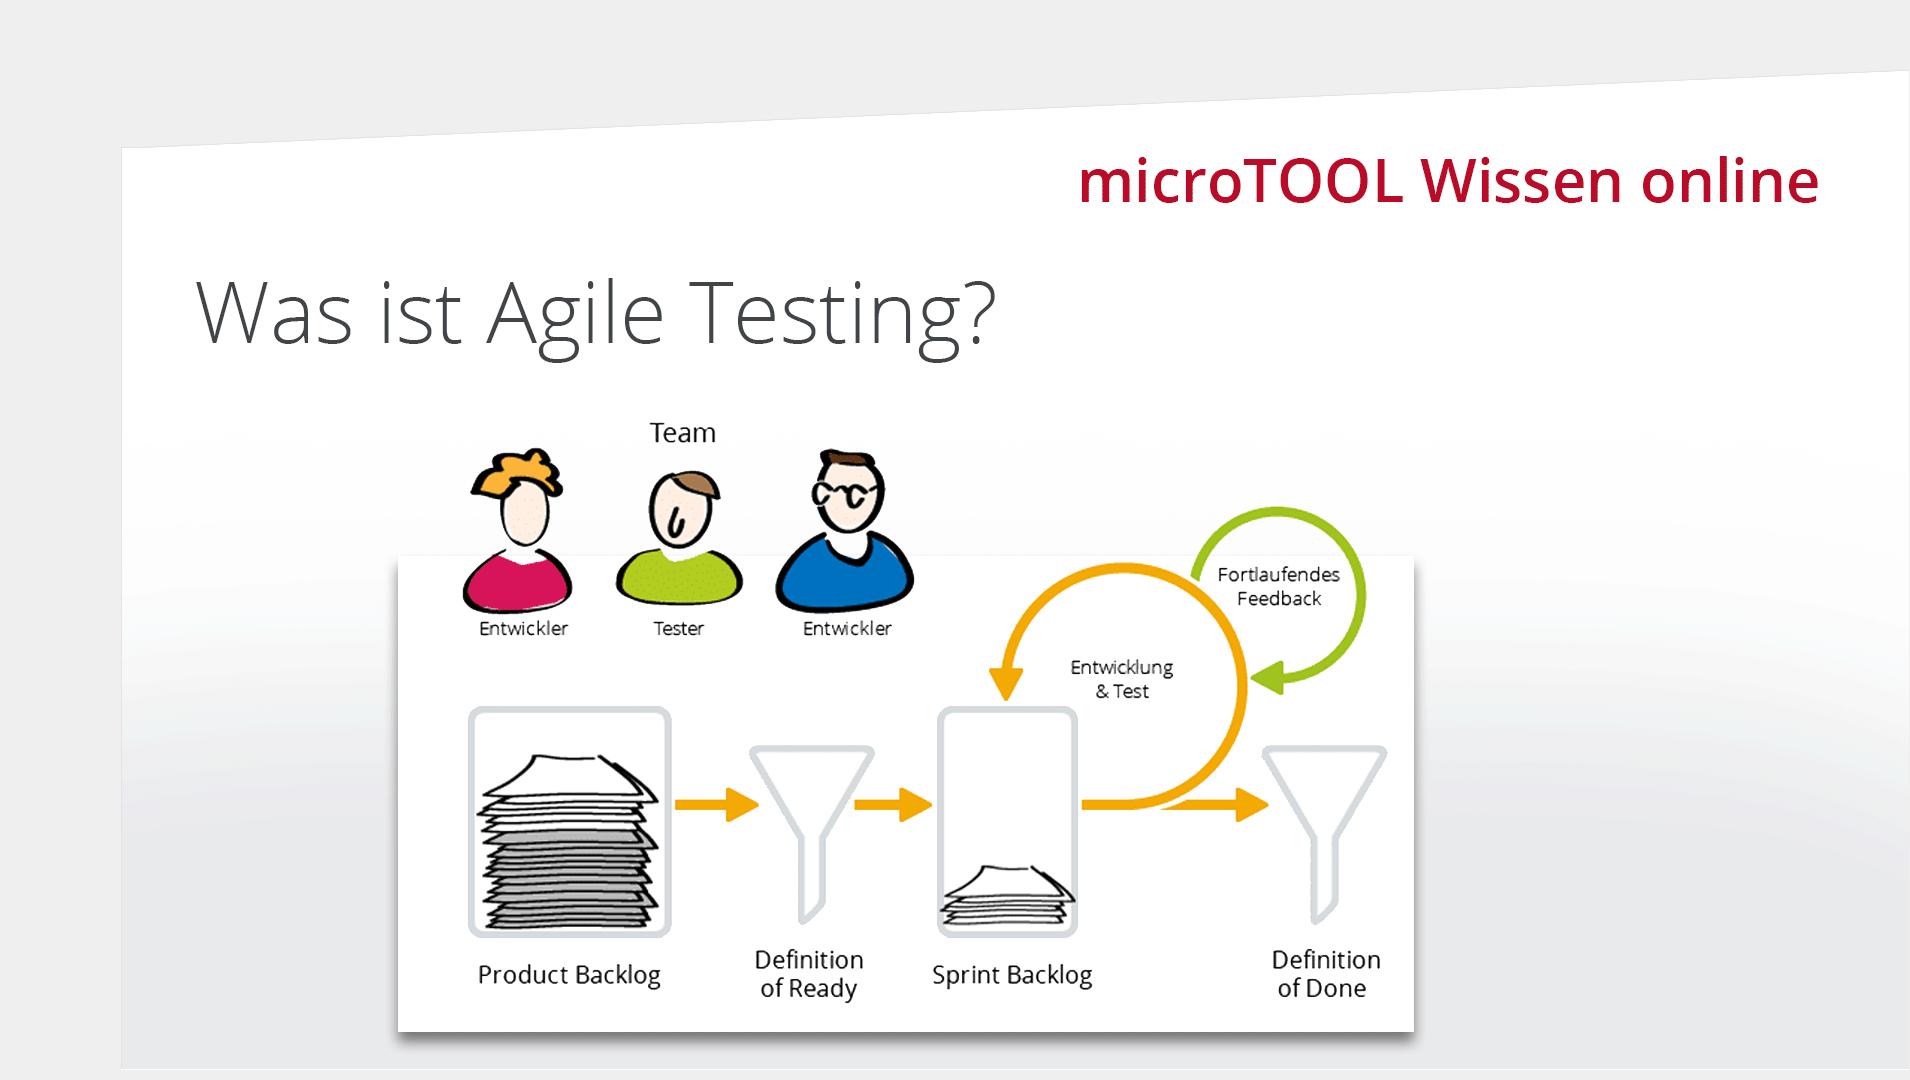 Was ist Agile Testing?